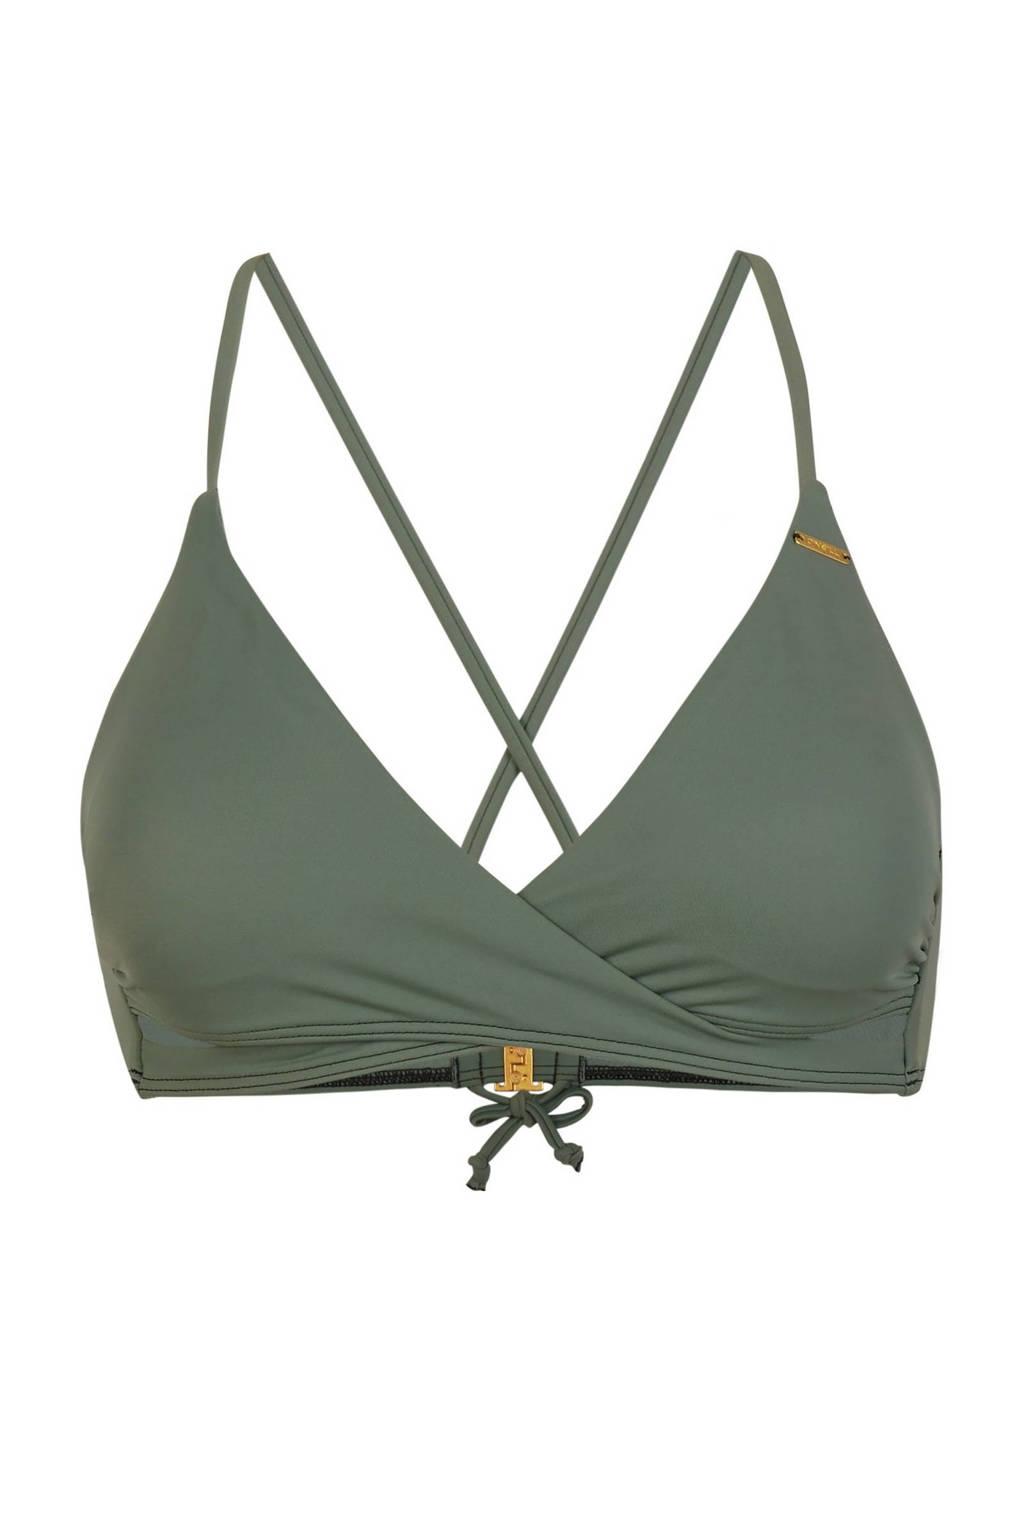 O'Neill Blue overslag triangel bikinitop Baay olijfgroen, Olijfgroen